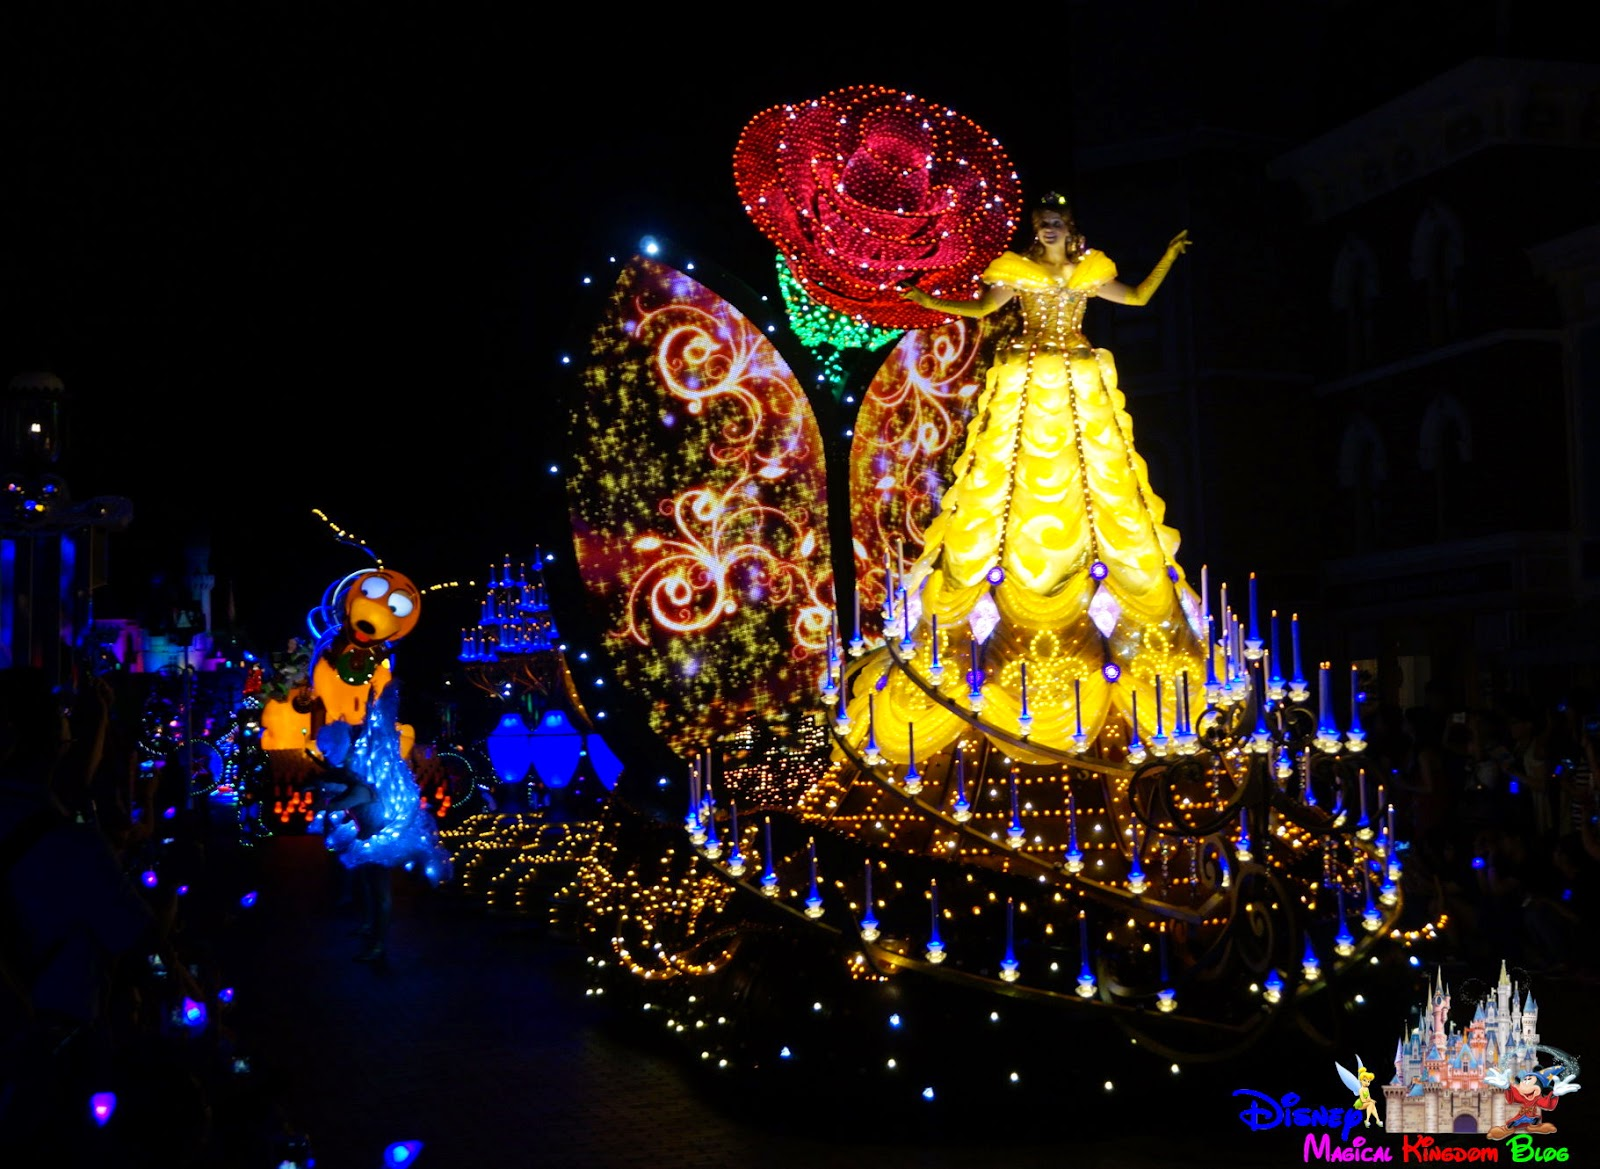 「迪士尼光影匯」炫目預演(Disney Paint the Night Premiere Preview)- 001